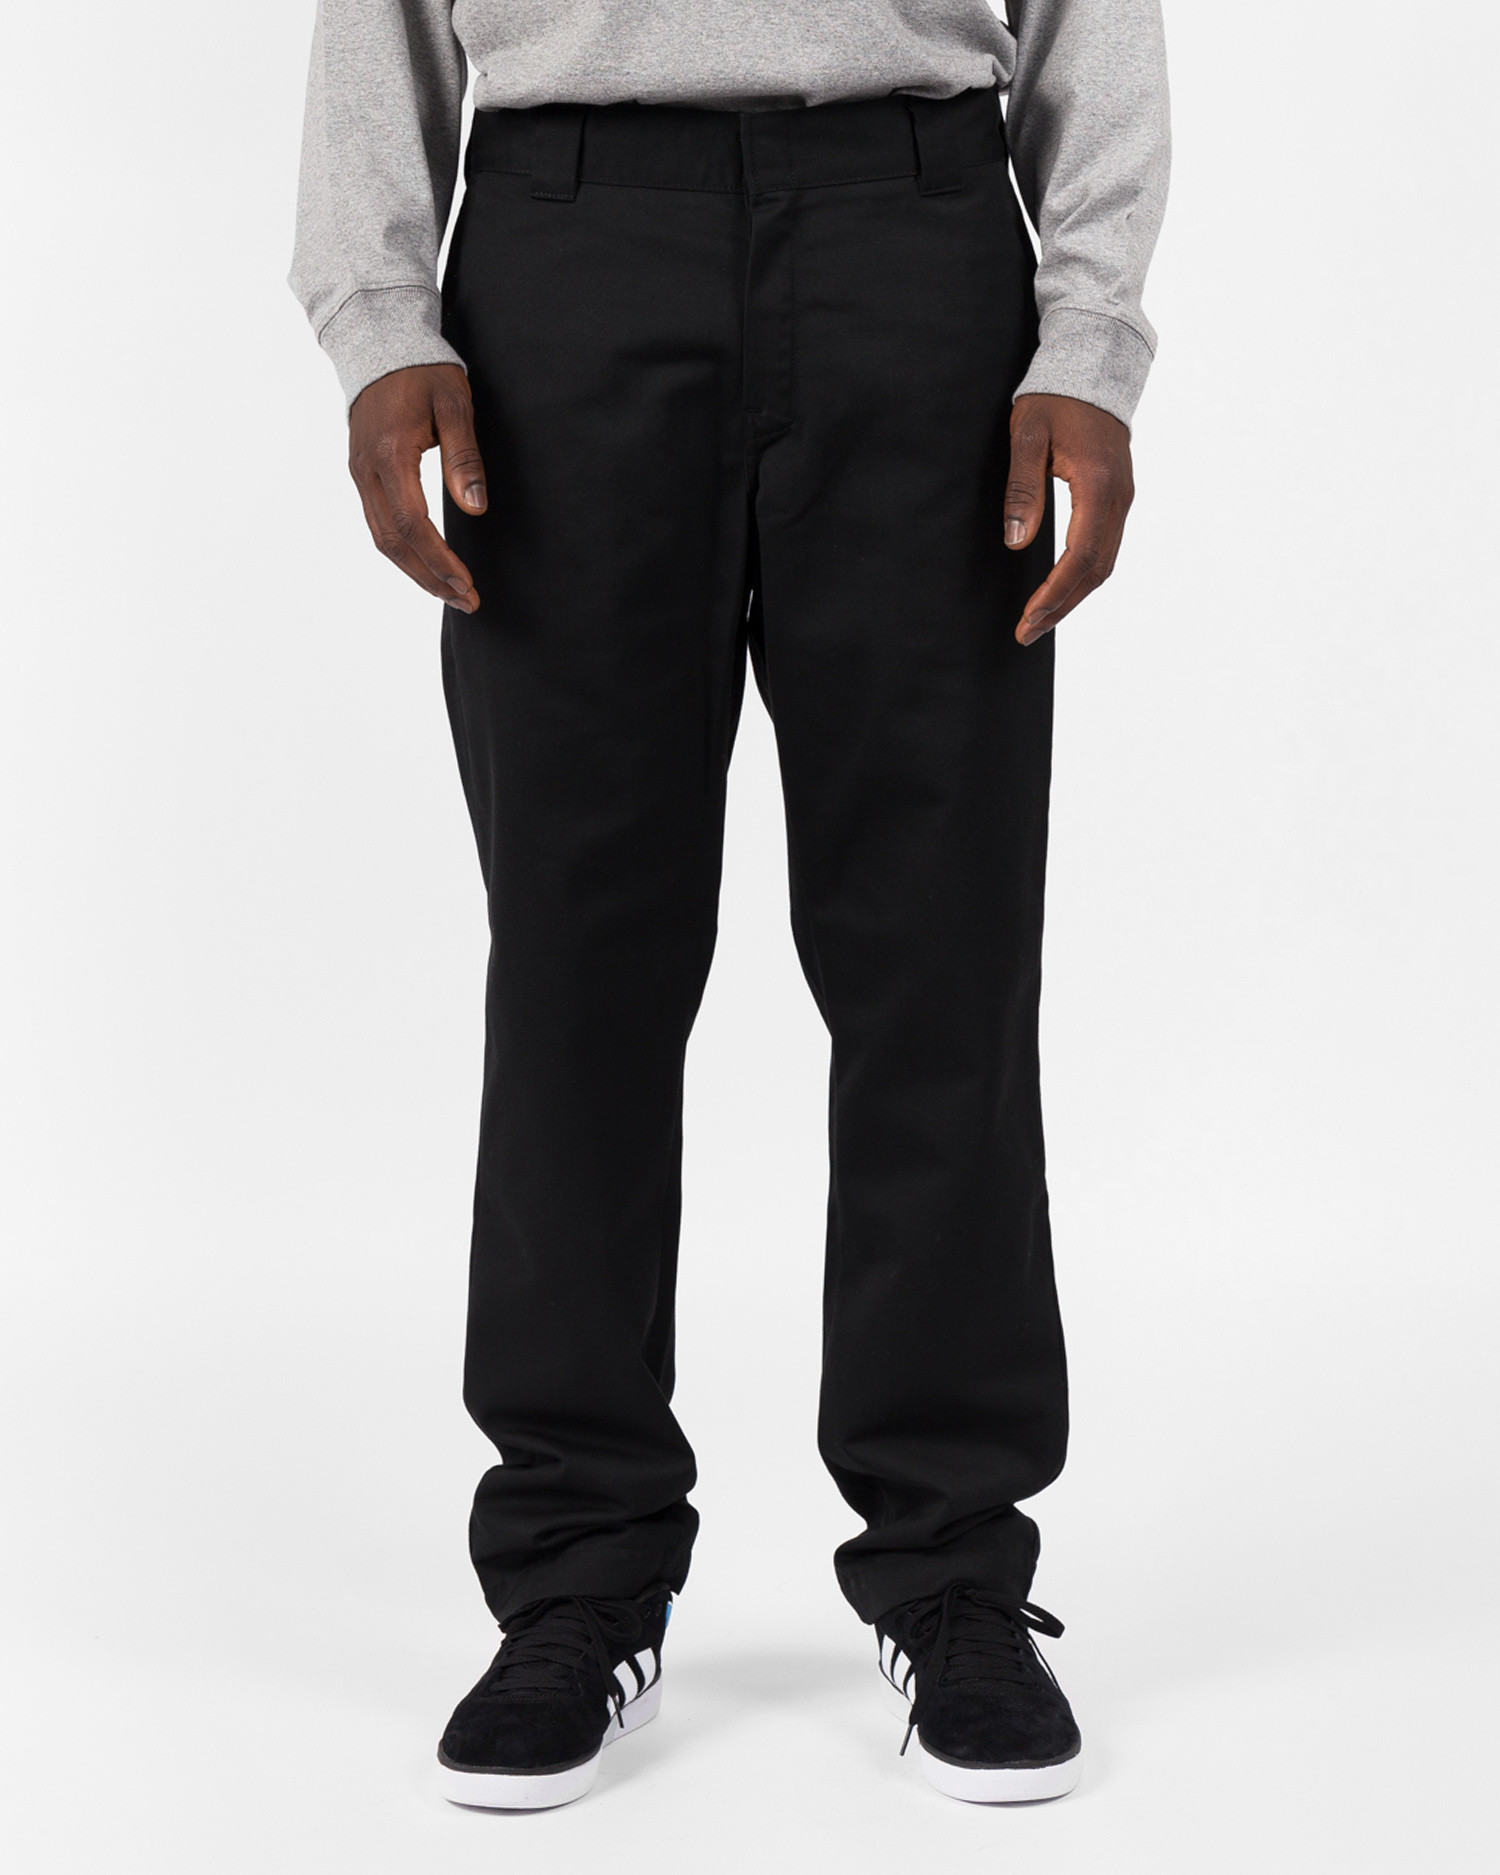 Carhartt master pant black rinsed